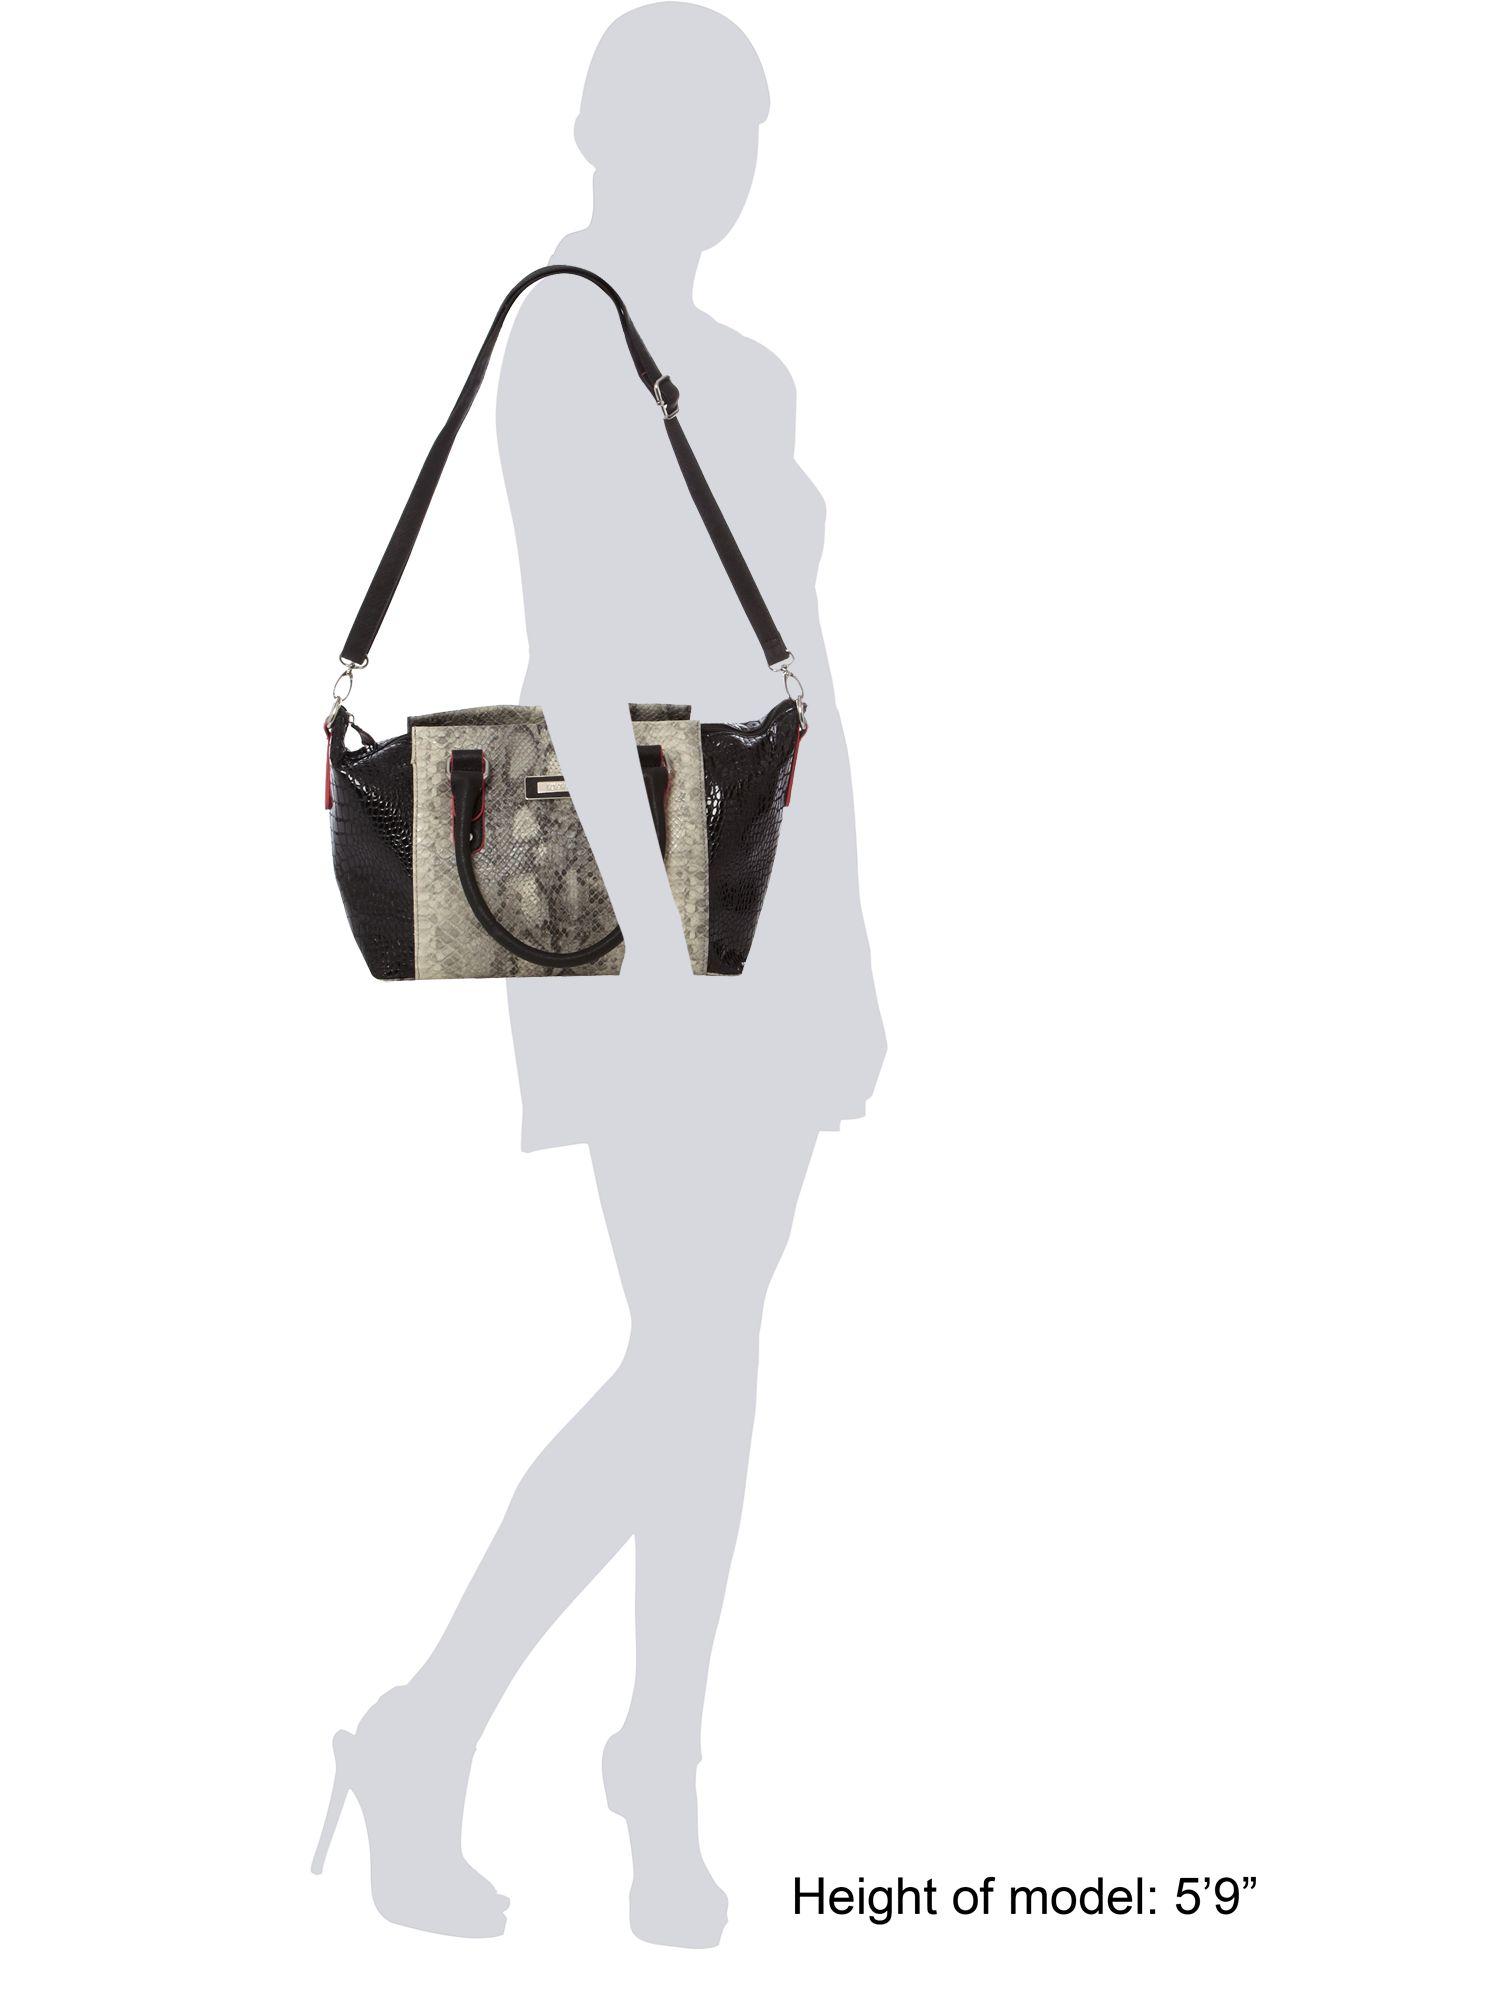 Kenneth Cole Reaction Magnolia Street Crossbody Bag in Black